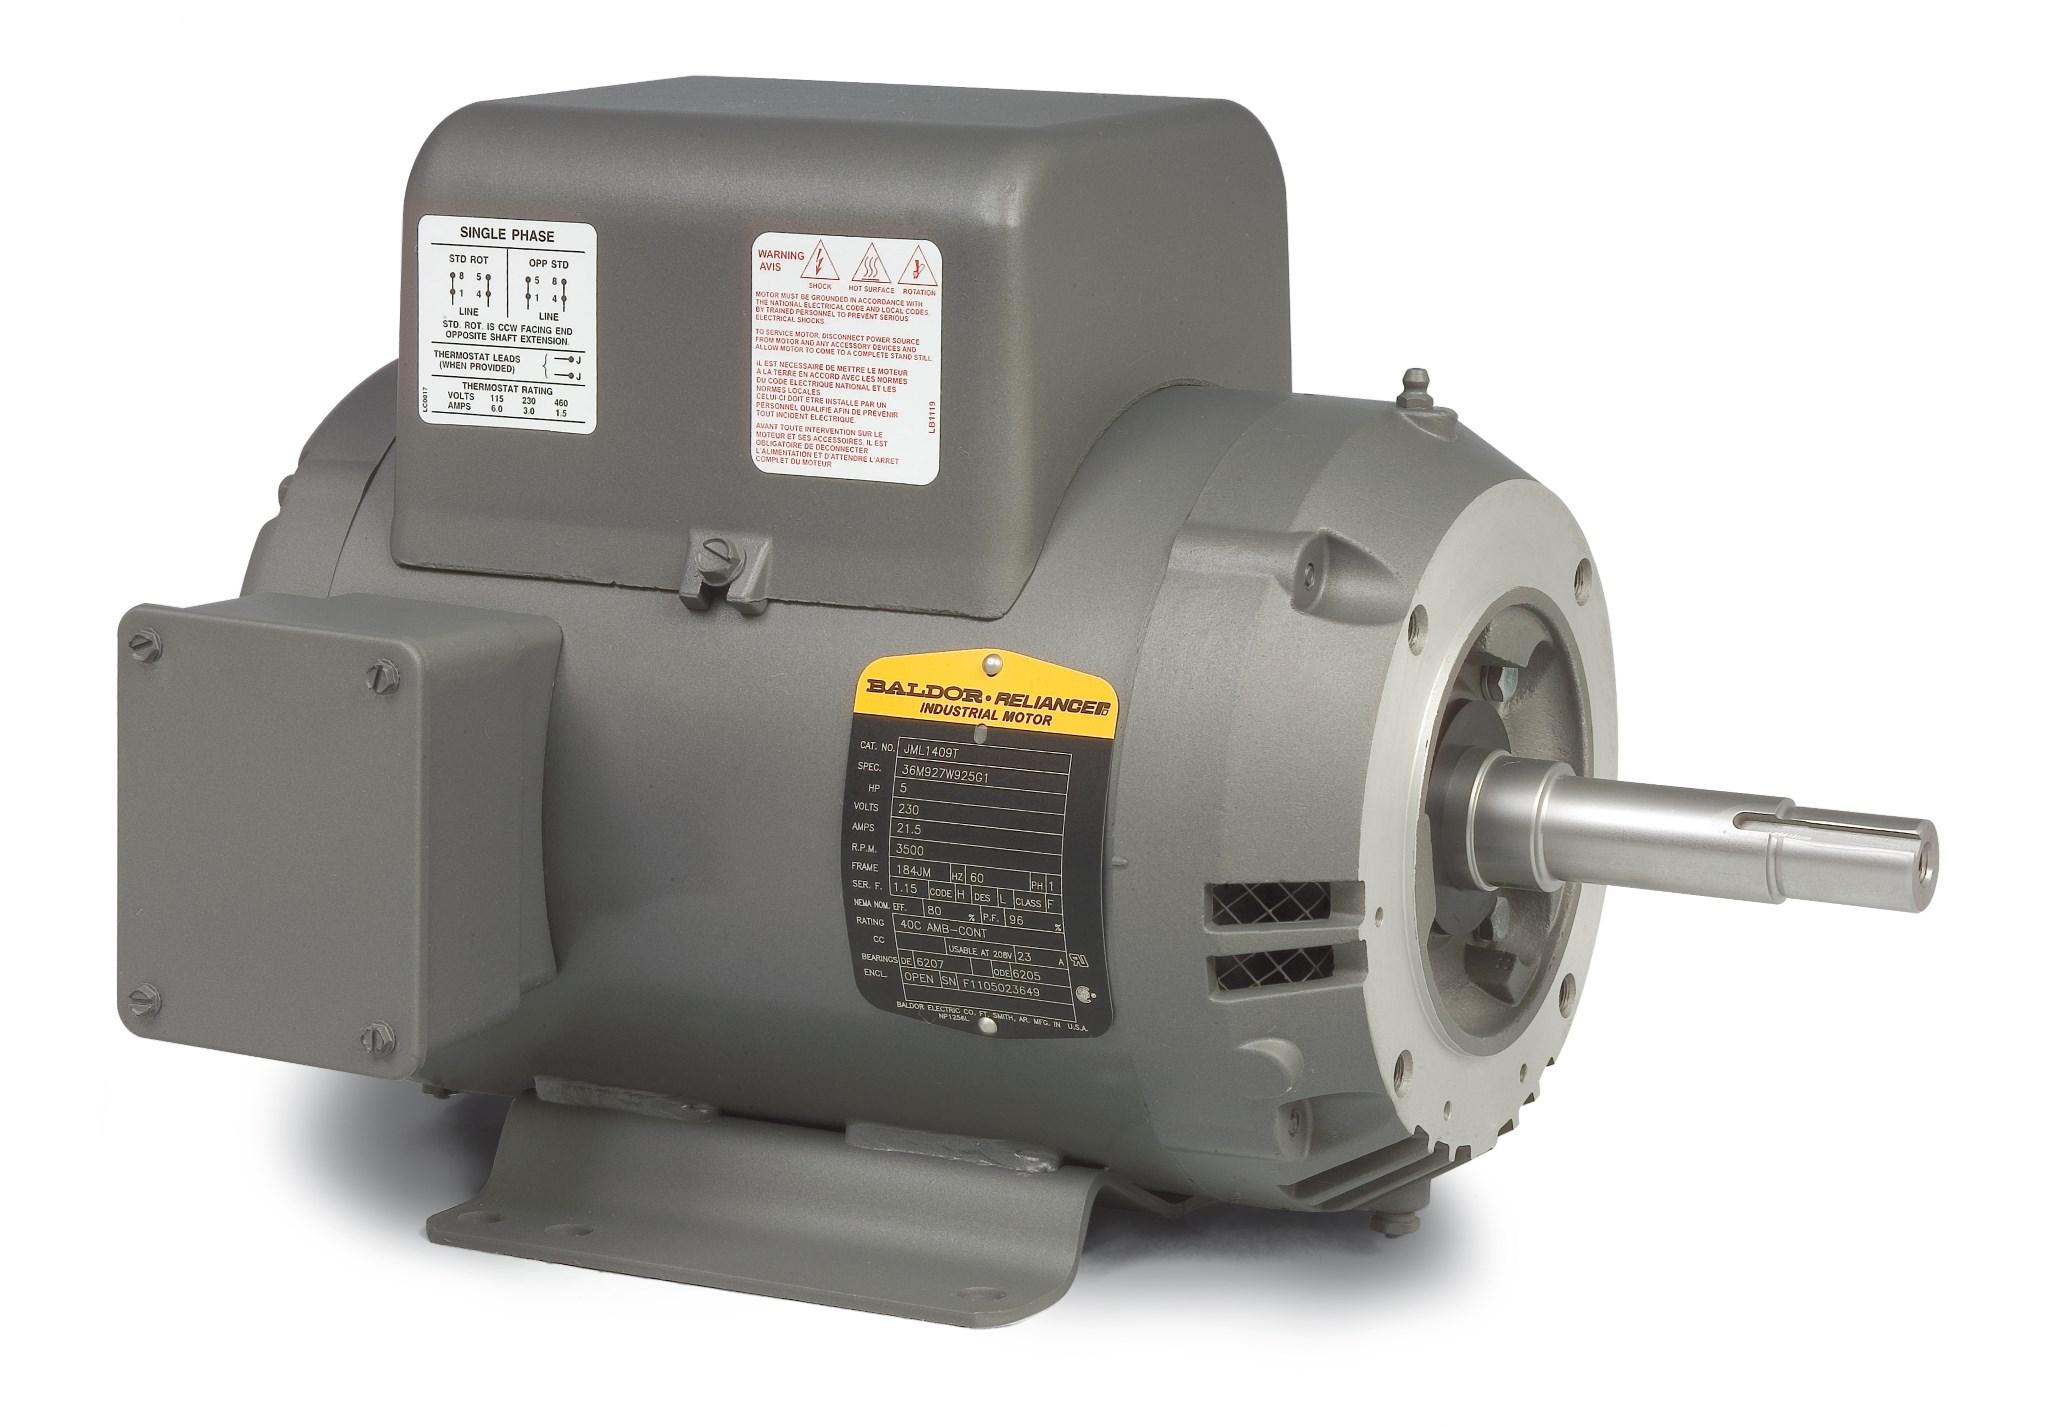 184t baldor electric motor wiring diagrams ao smith for Ao smith electric motors